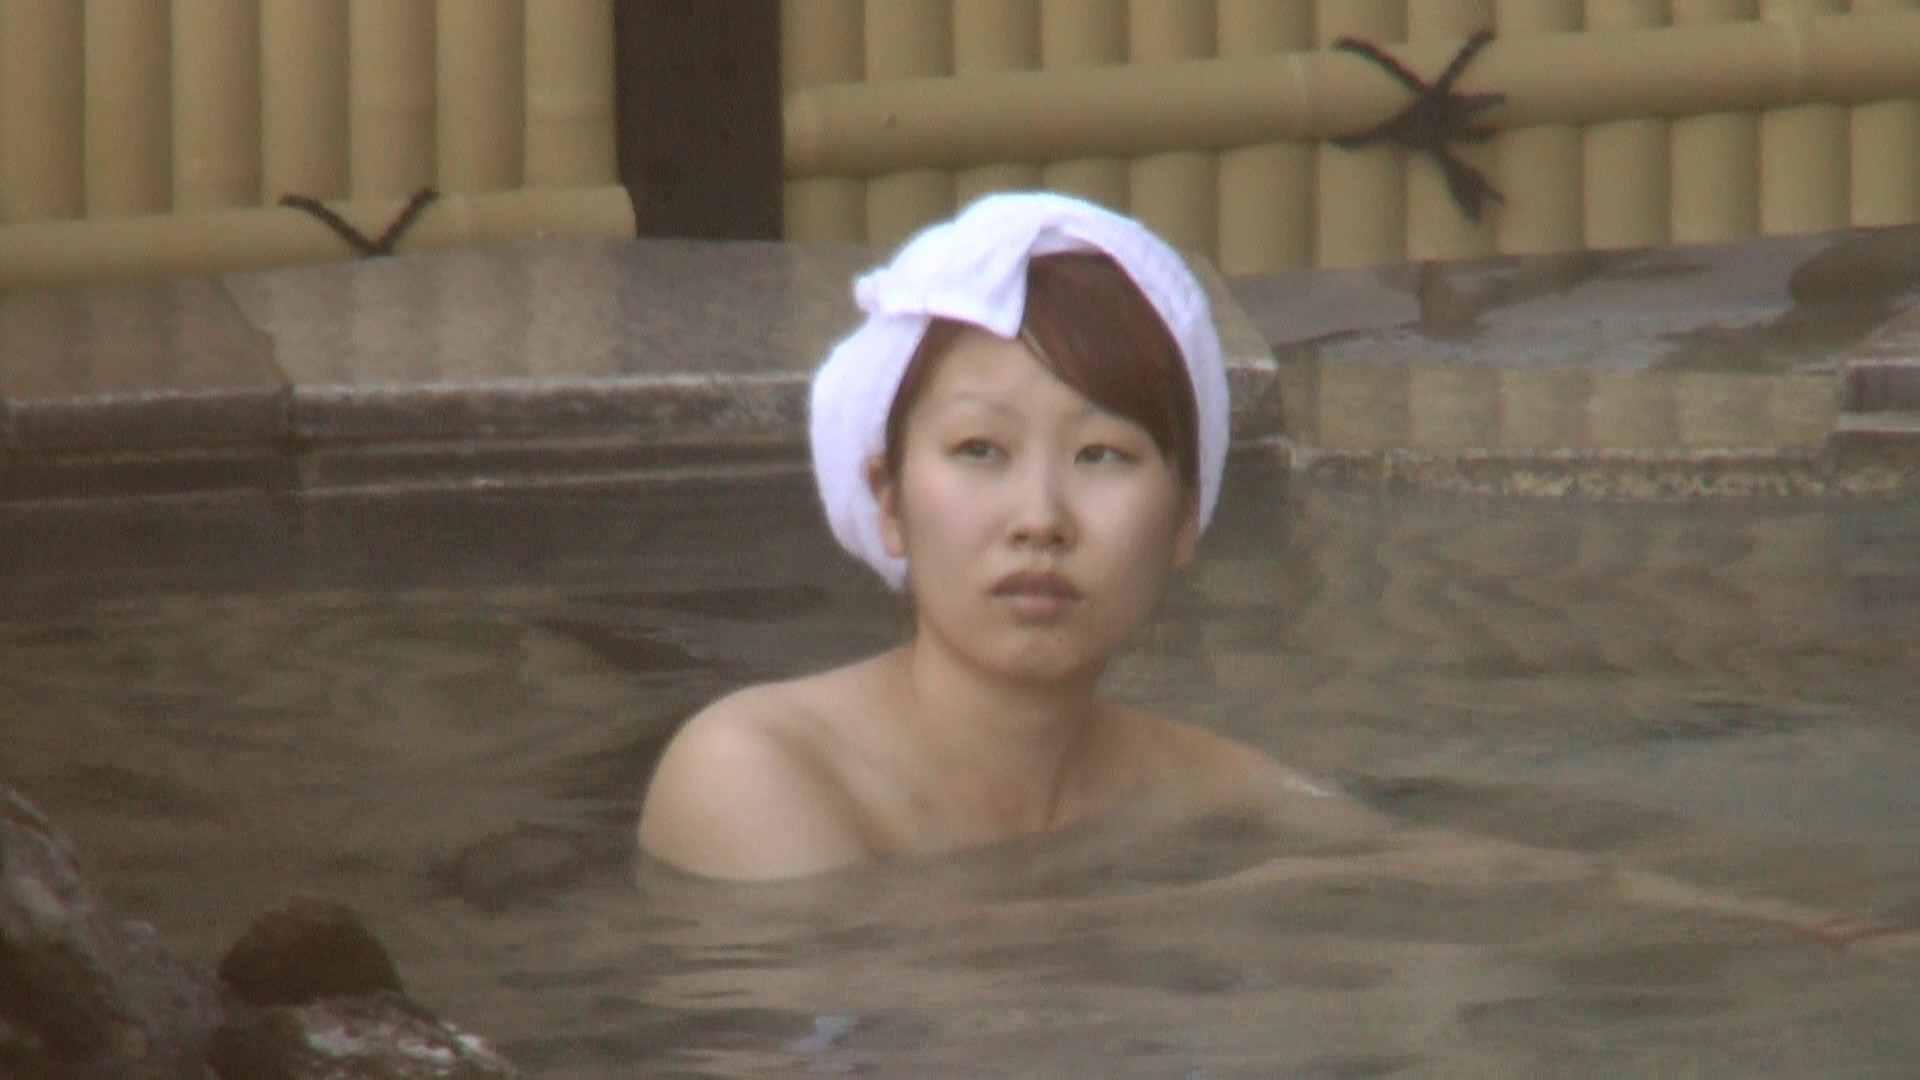 Aquaな露天風呂Vol.210 露天風呂突入 オマンコ動画キャプチャ 75pic 26